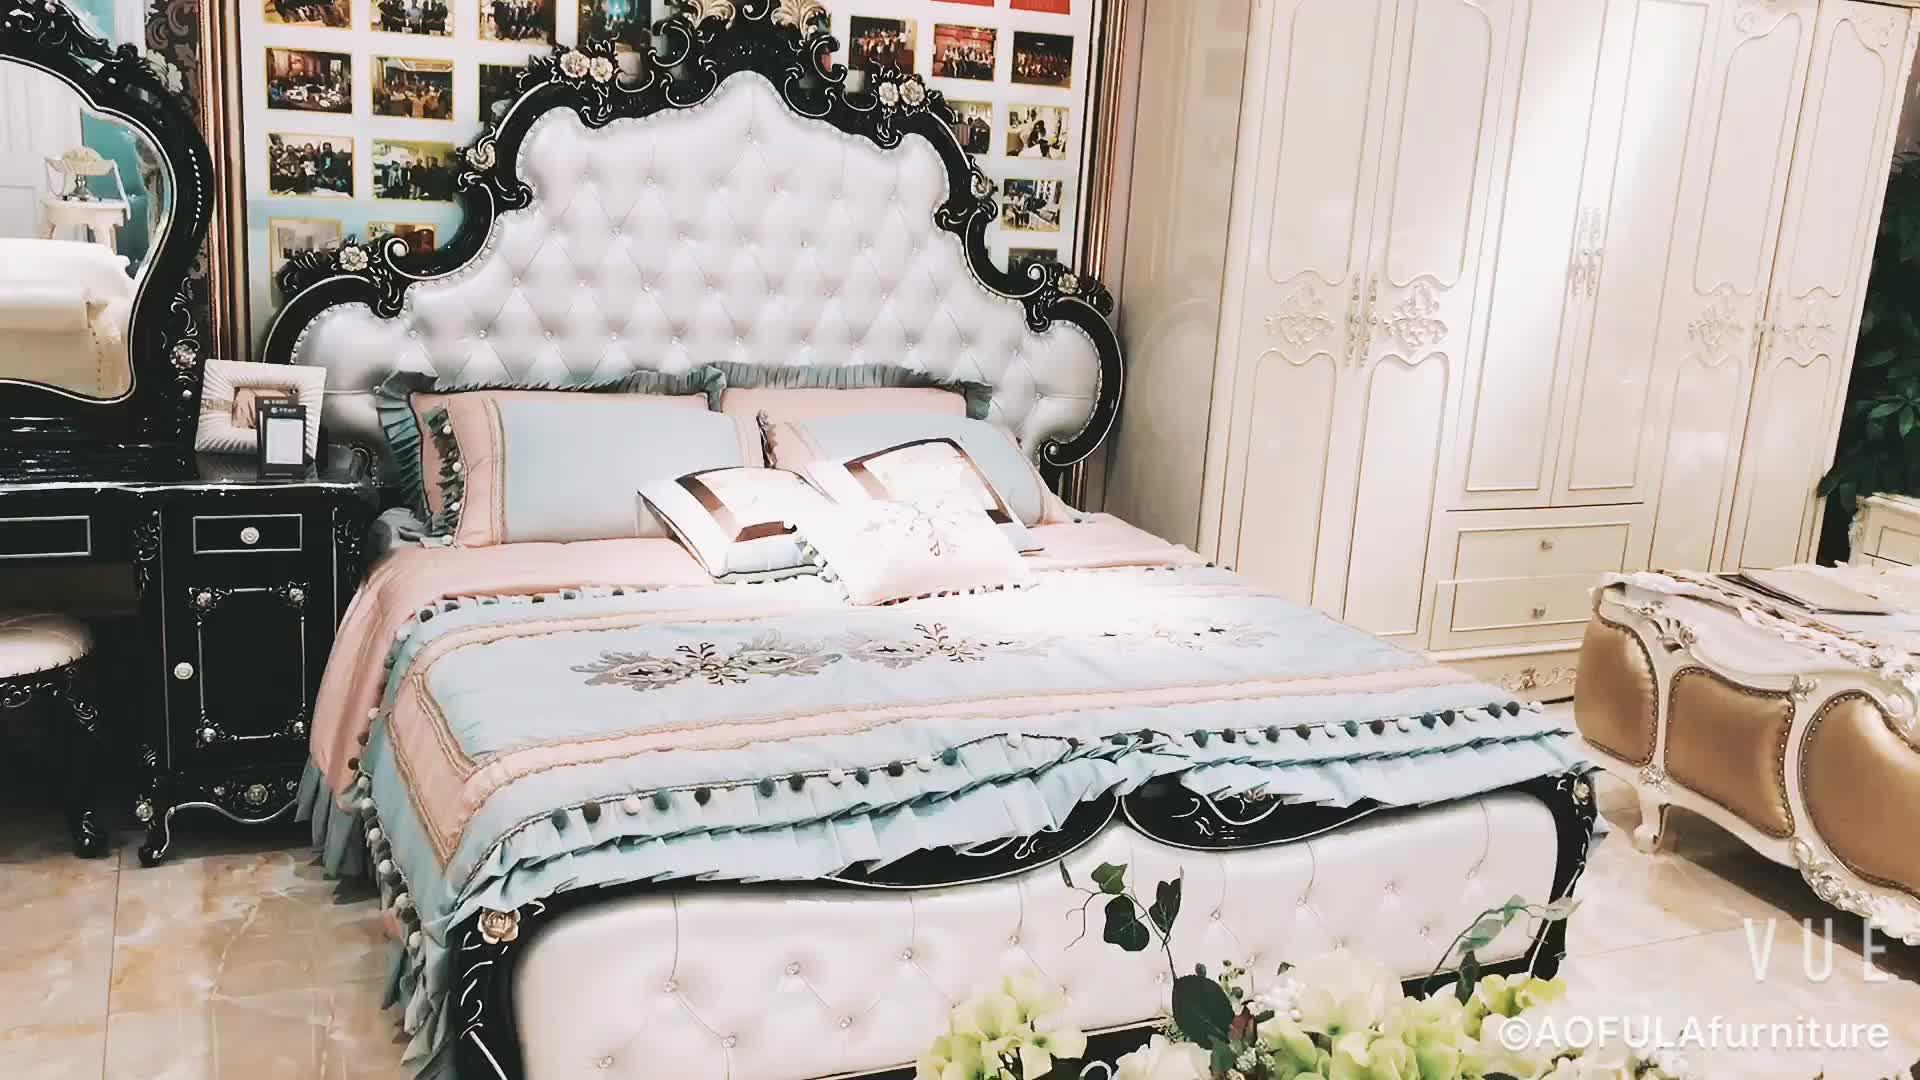 French royal furniture jordans white antique bedroom sets buy bedroom sets antique bedroom for Jordans furniture bedroom sets